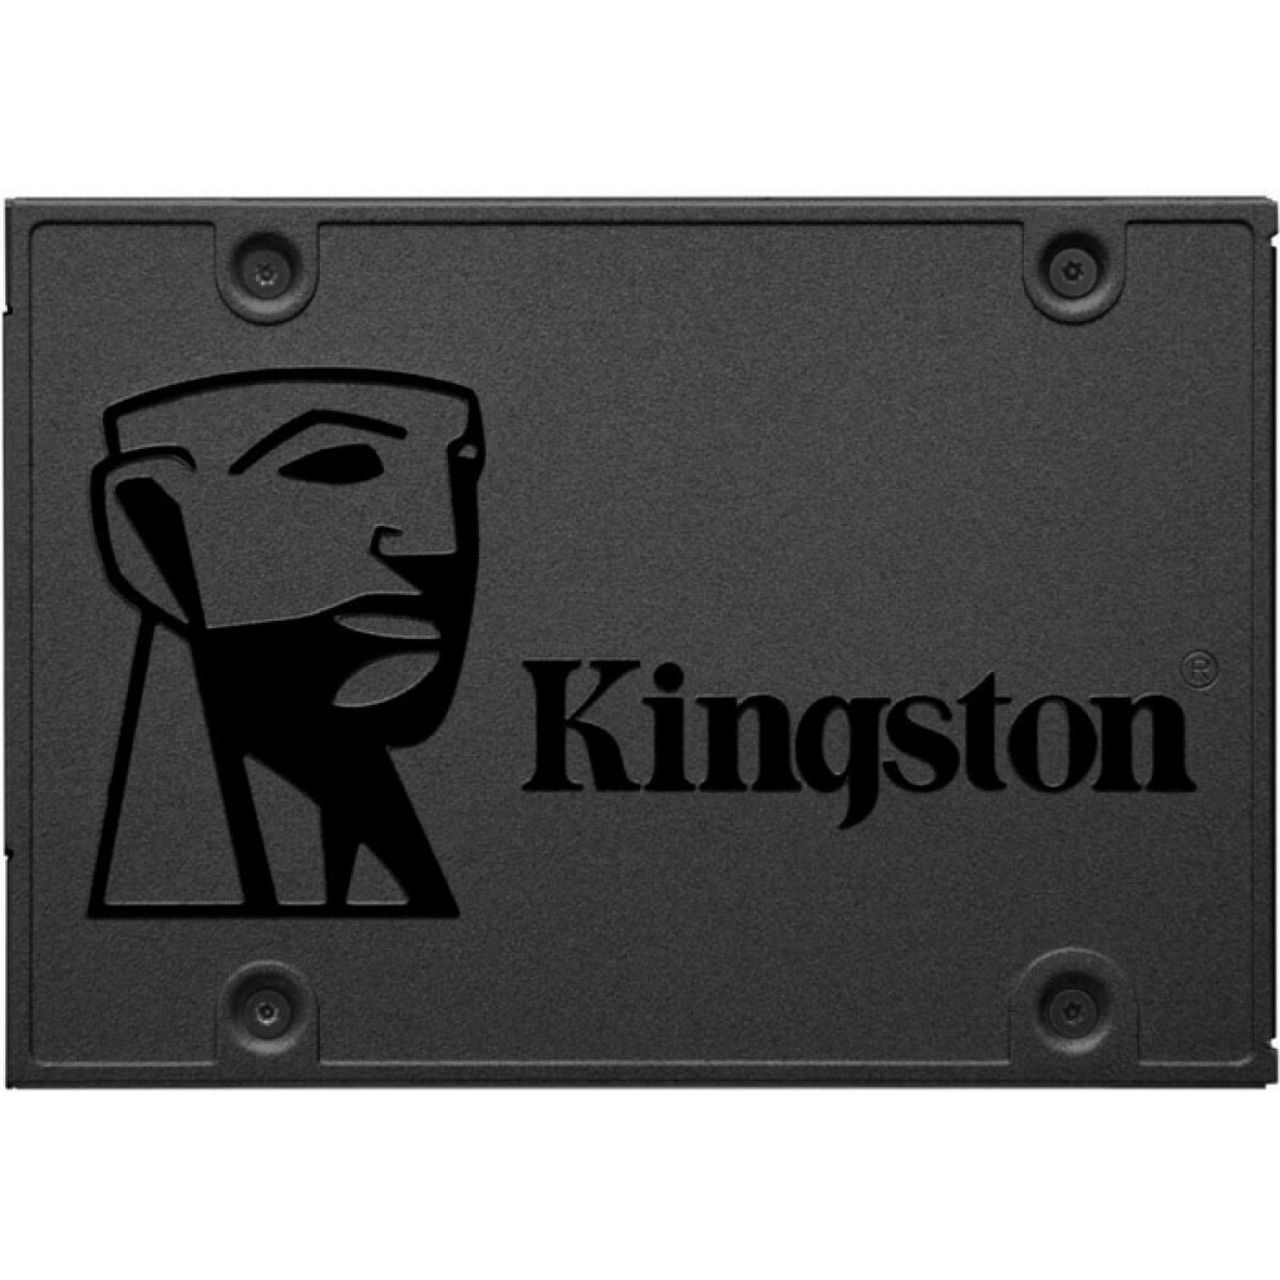 SSD Kingston A400, 480GB, SATA, Leitura 500MB/s, Gravação 450MB/s - SA400S37/480GB